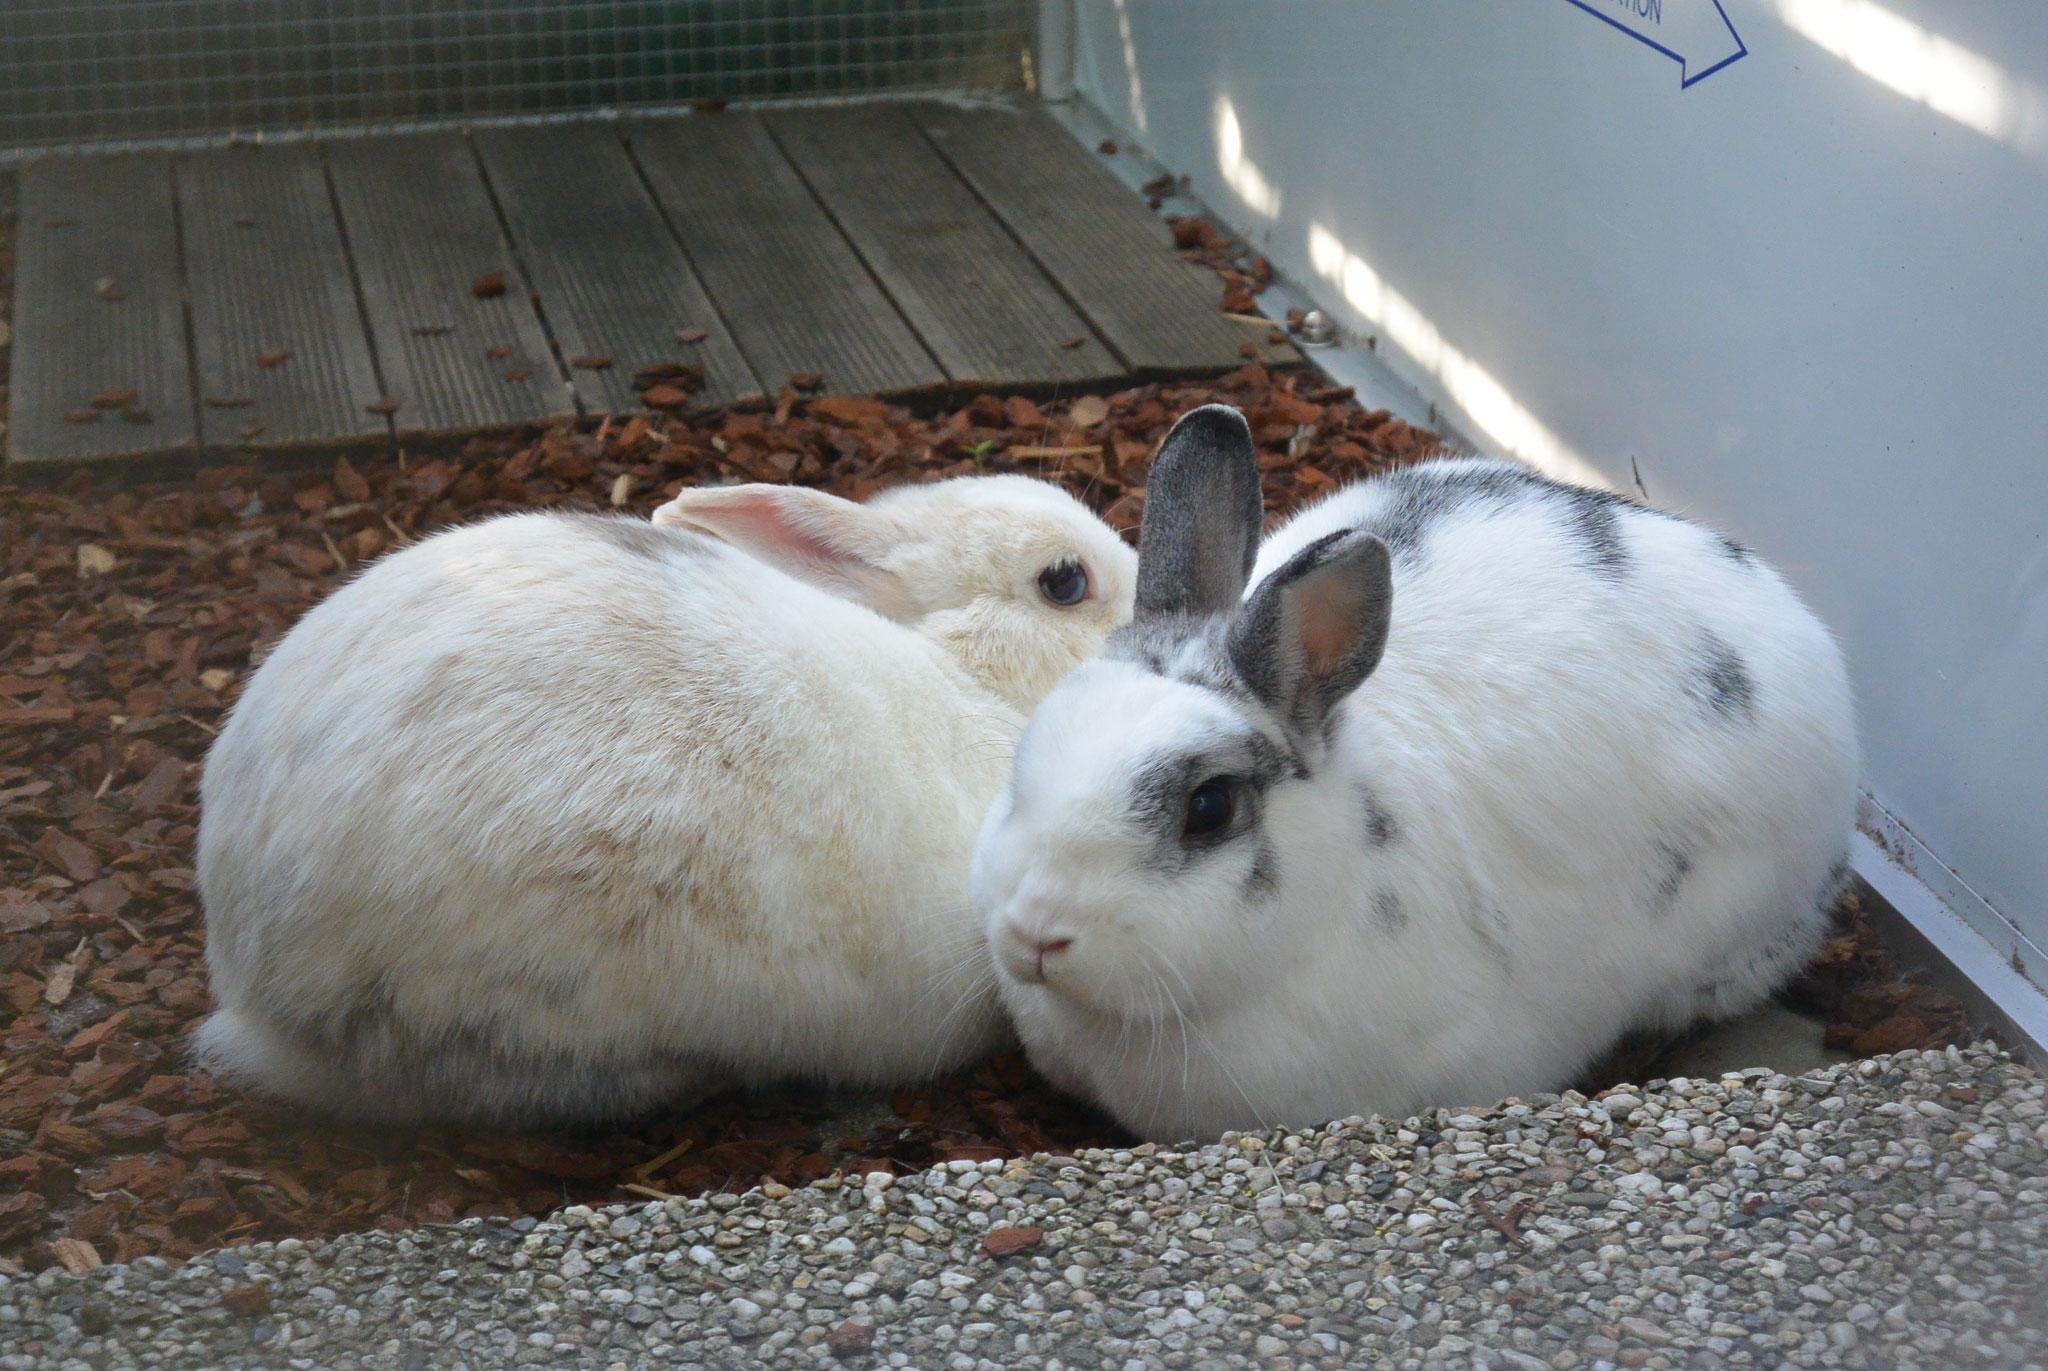 Nini & Silbry